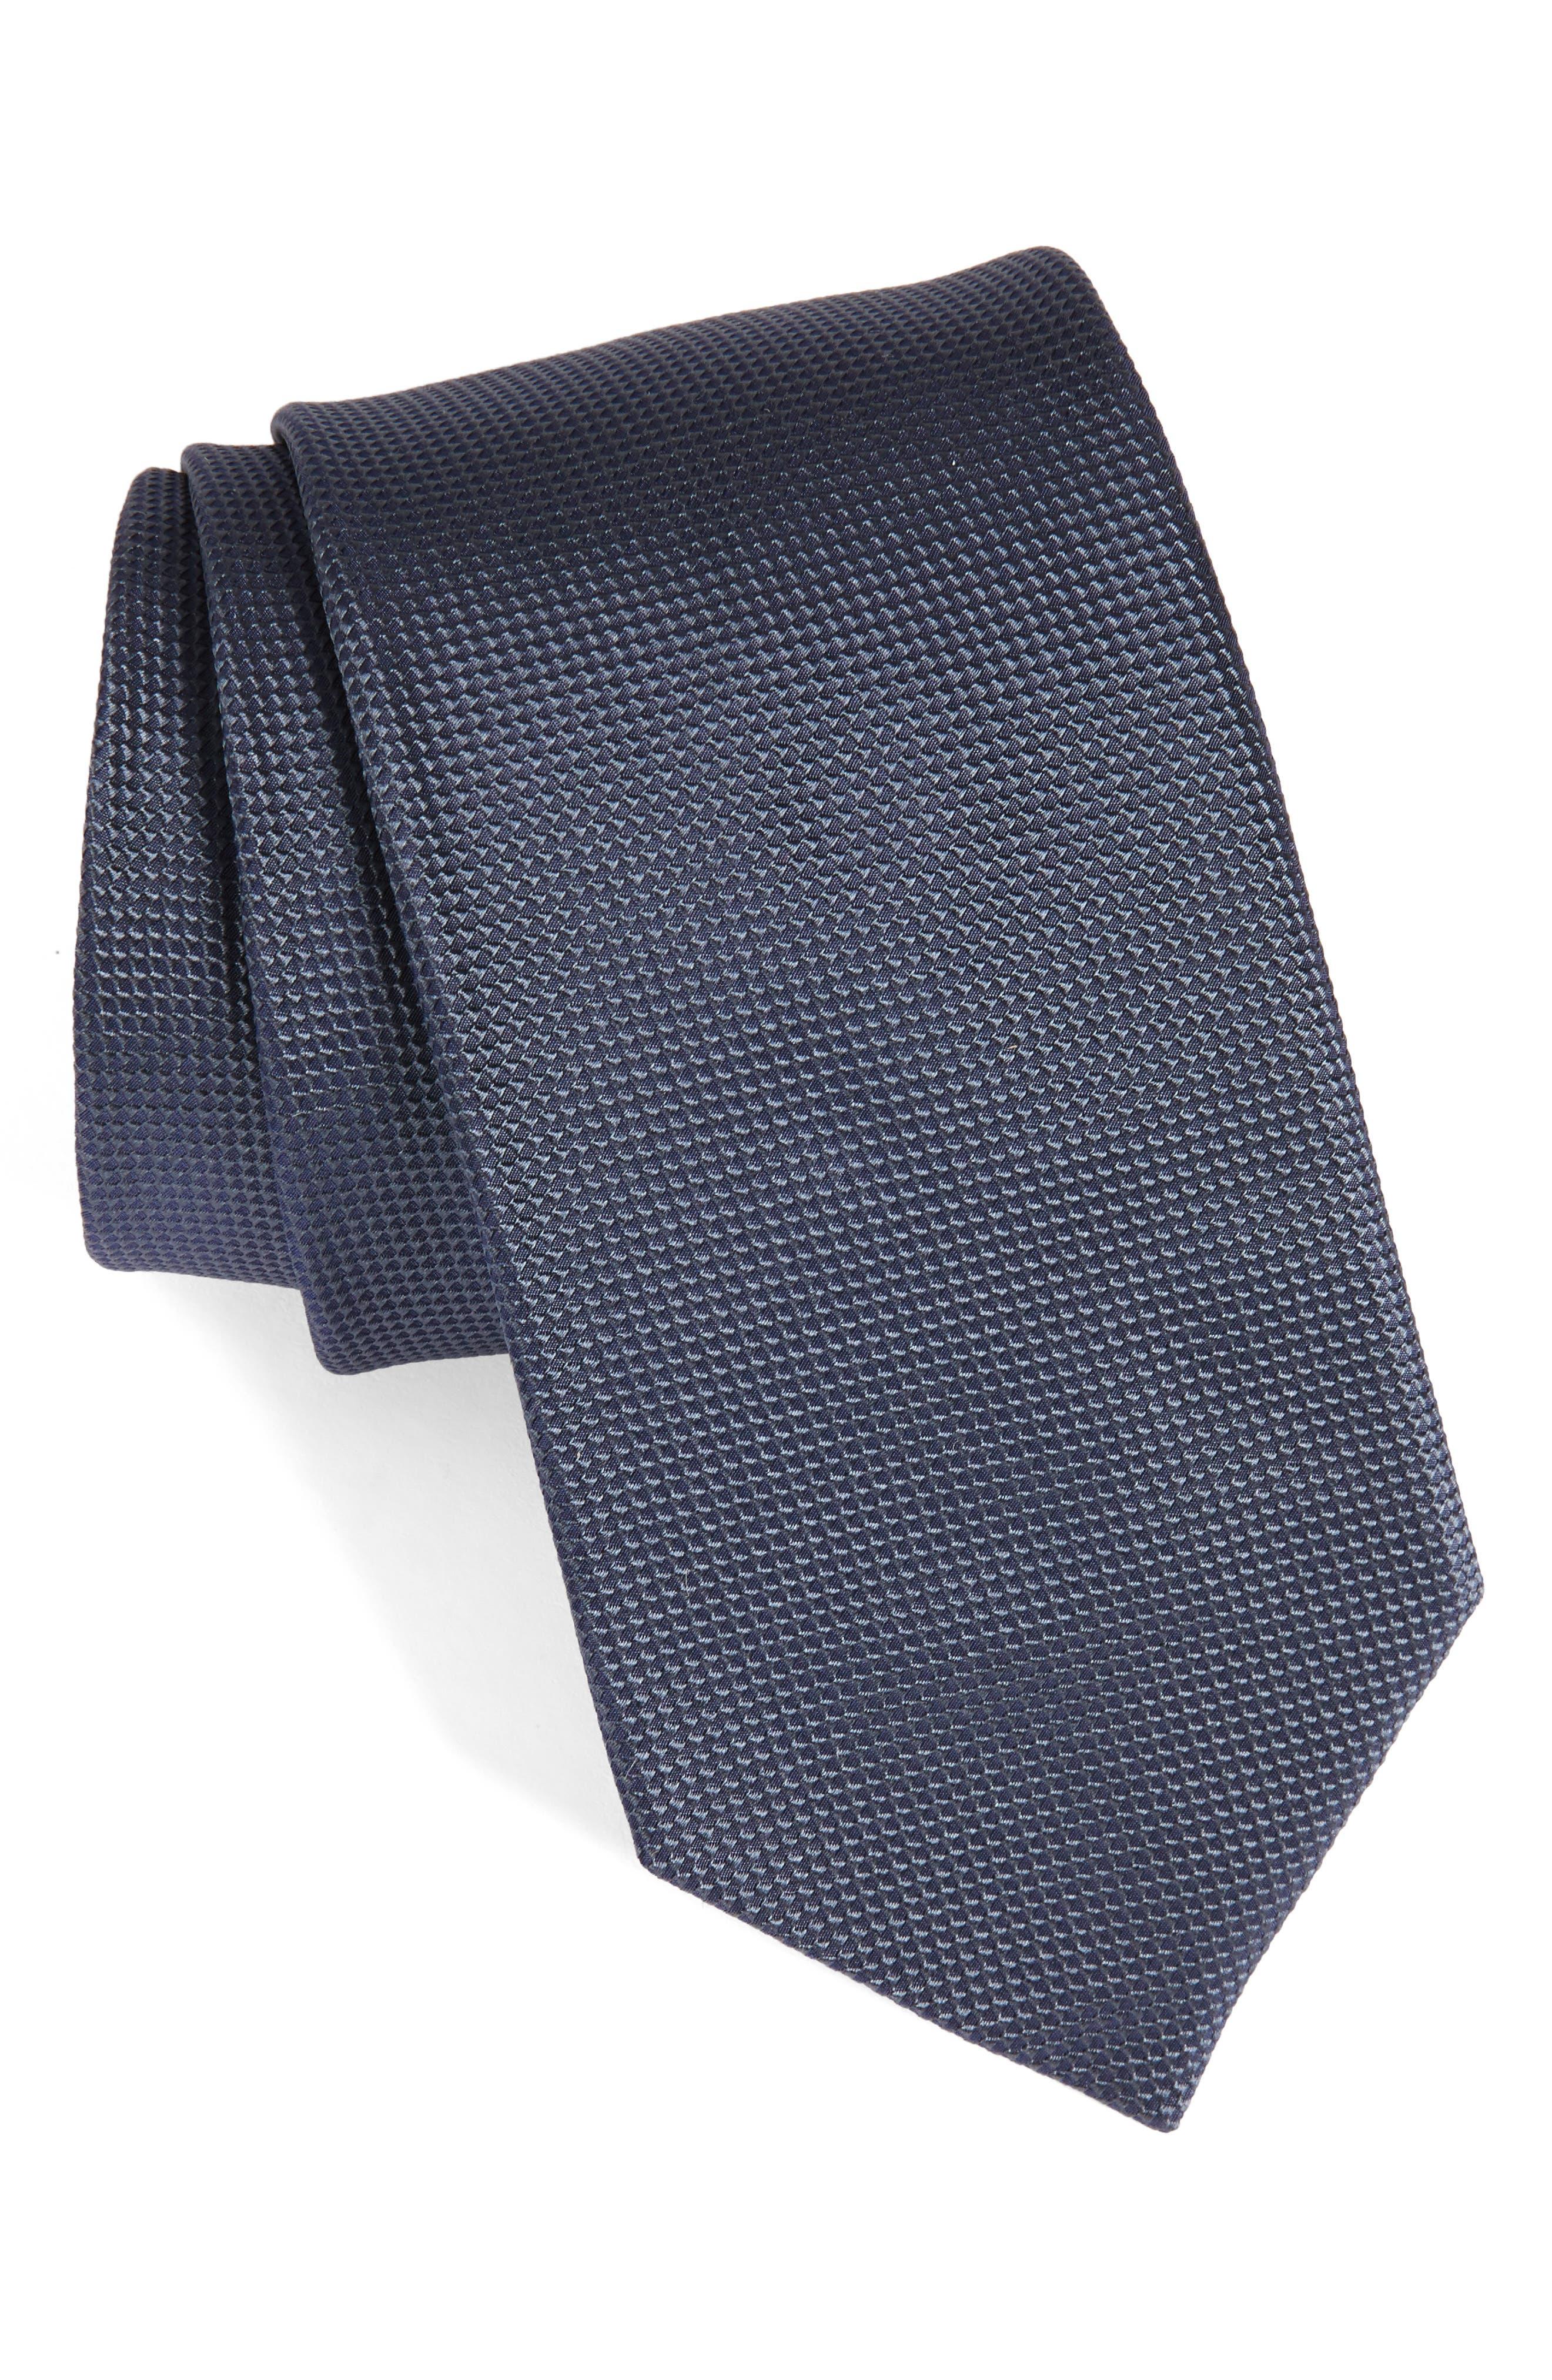 Alternate Image 1 Selected - BOSS Solid Silk Tie